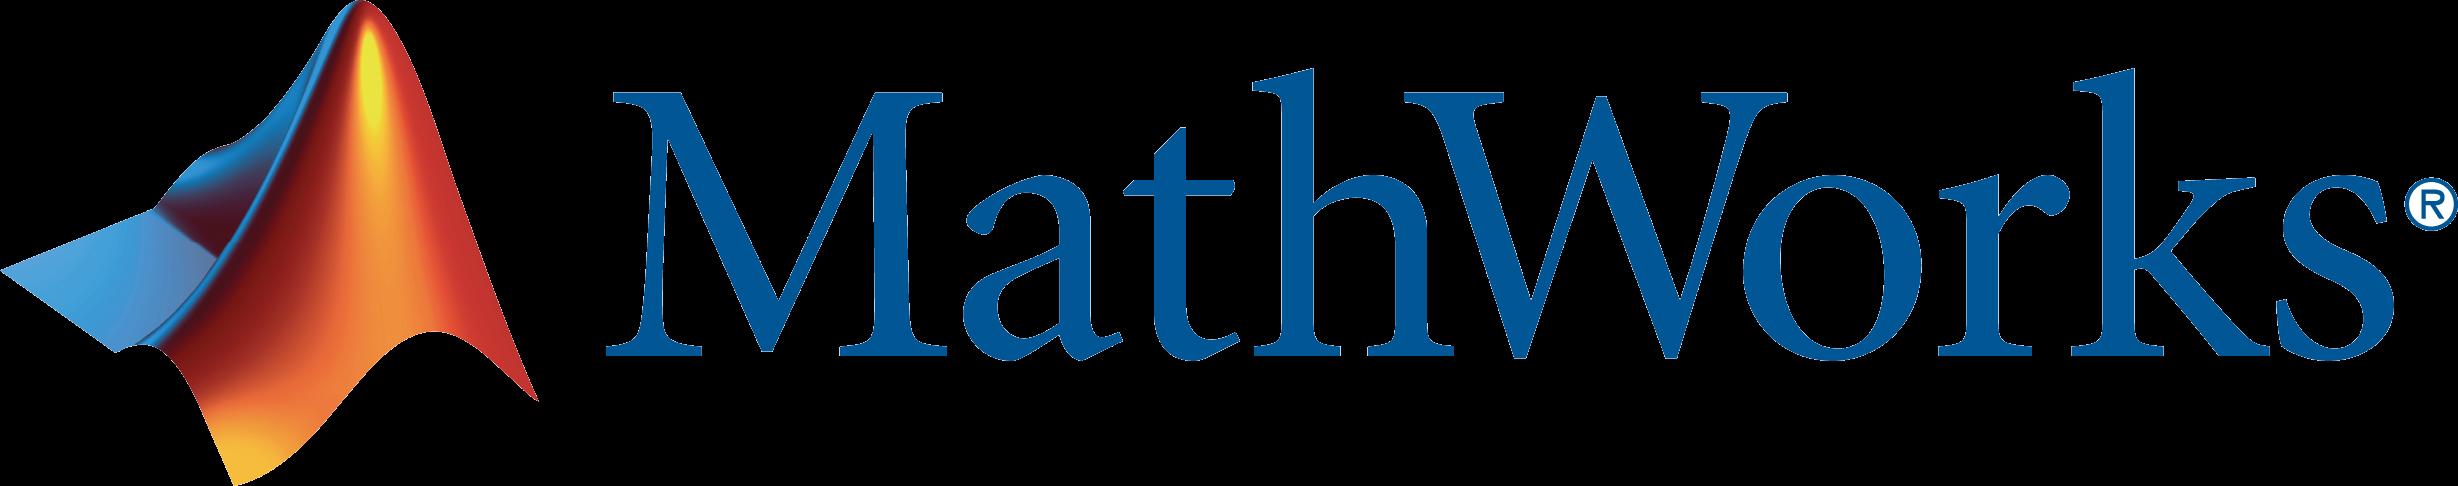 SoC design services using the Mathworks DSP tools